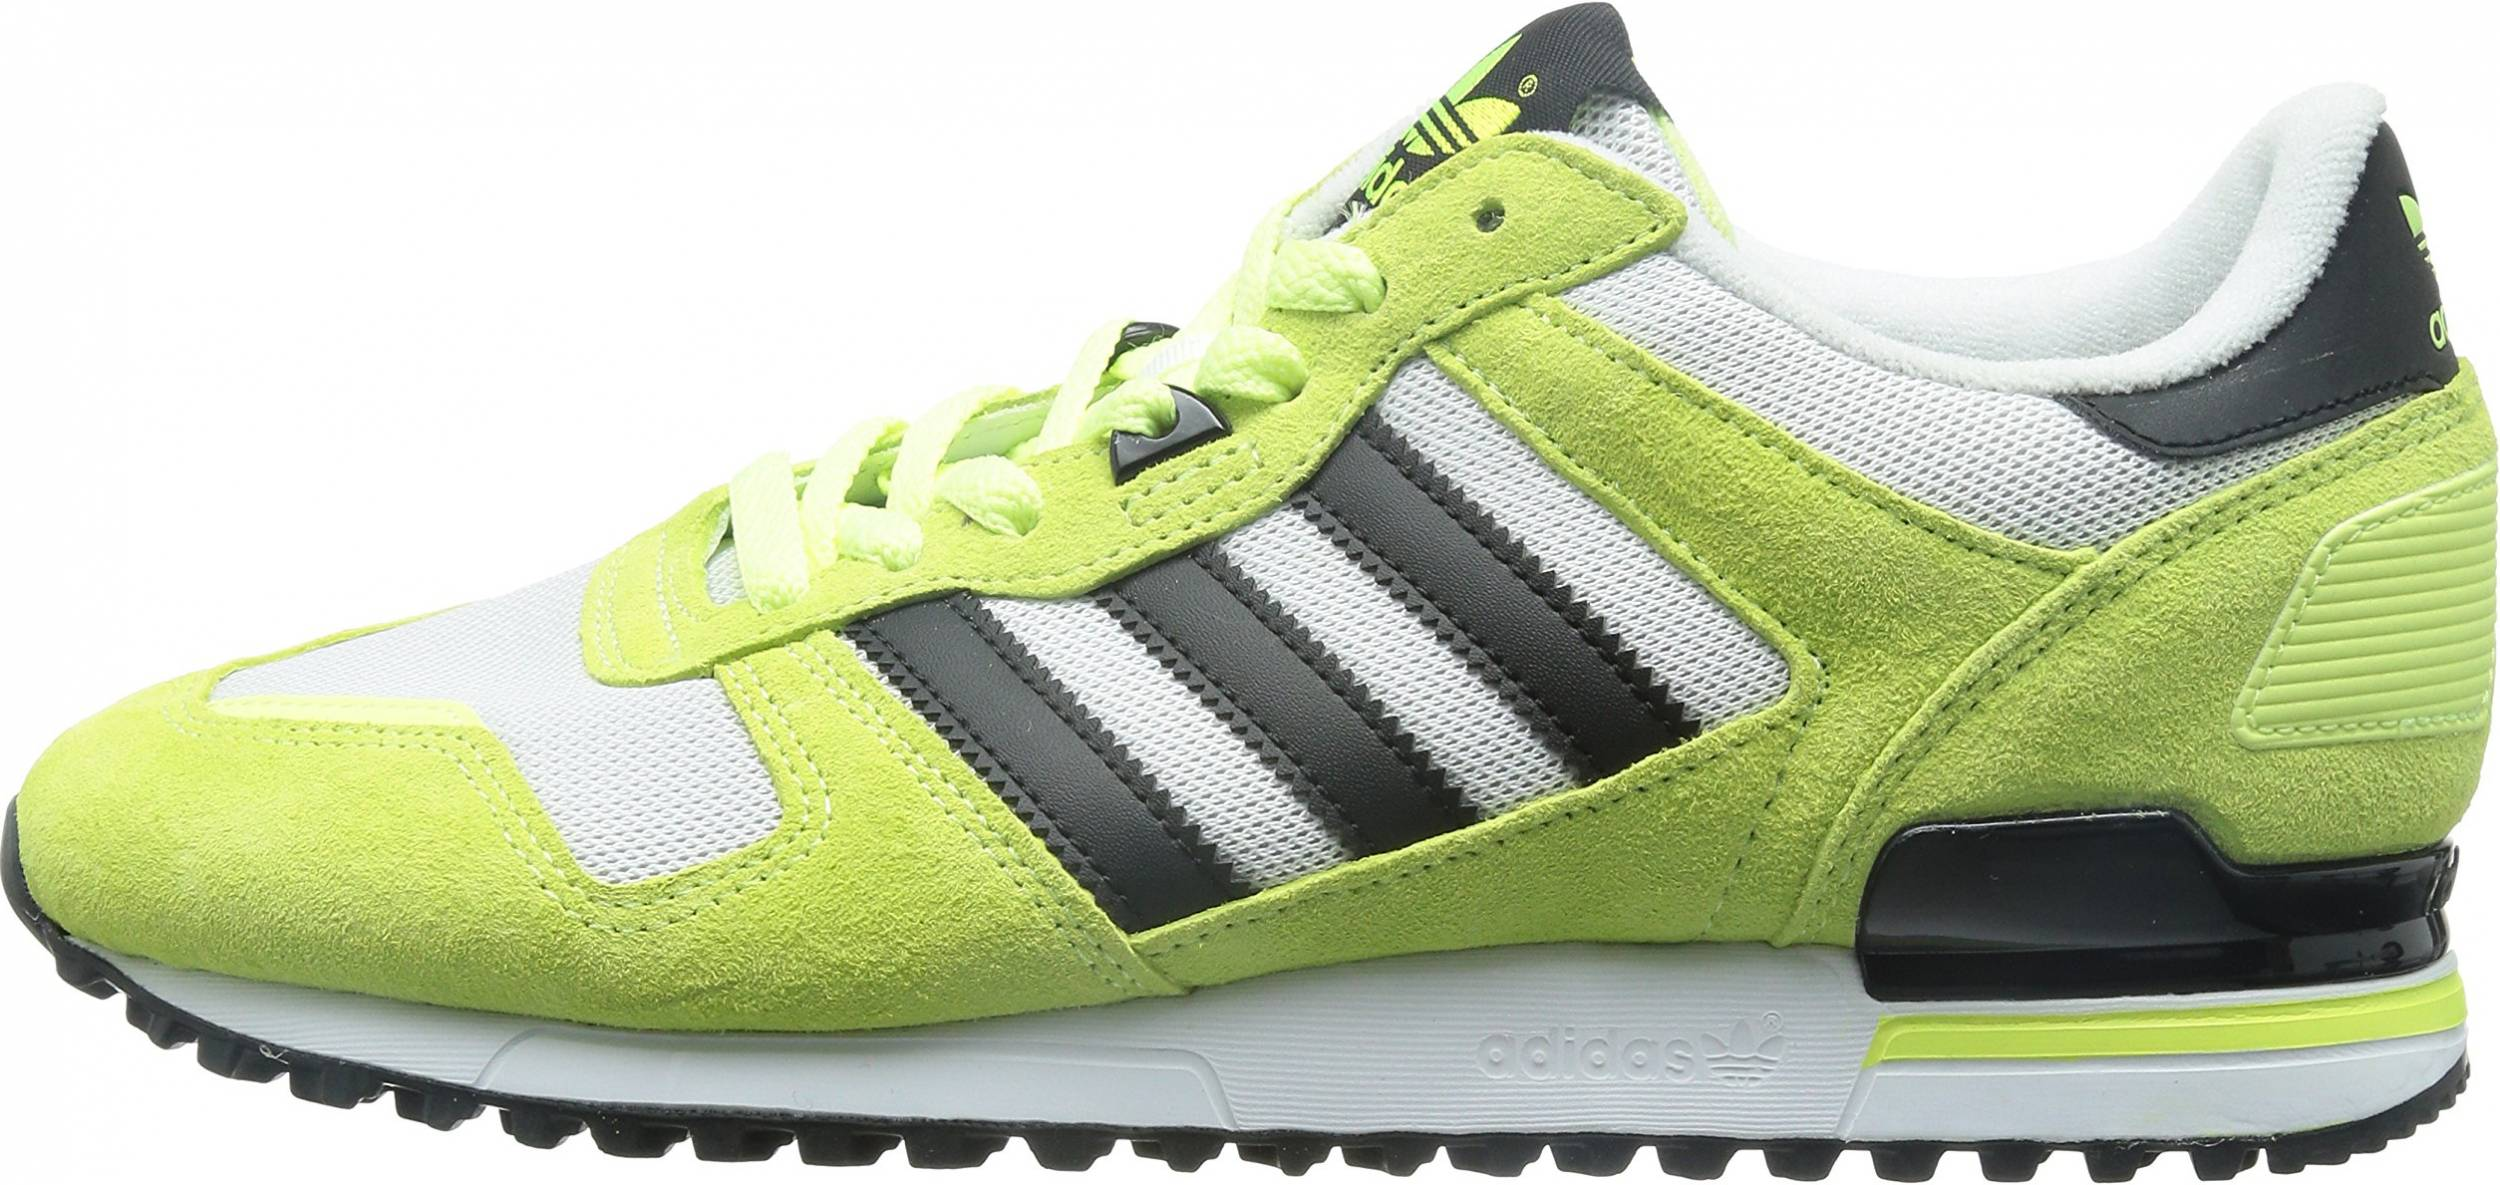 Adidas ZX 700 sneakers in green | RunRepeat